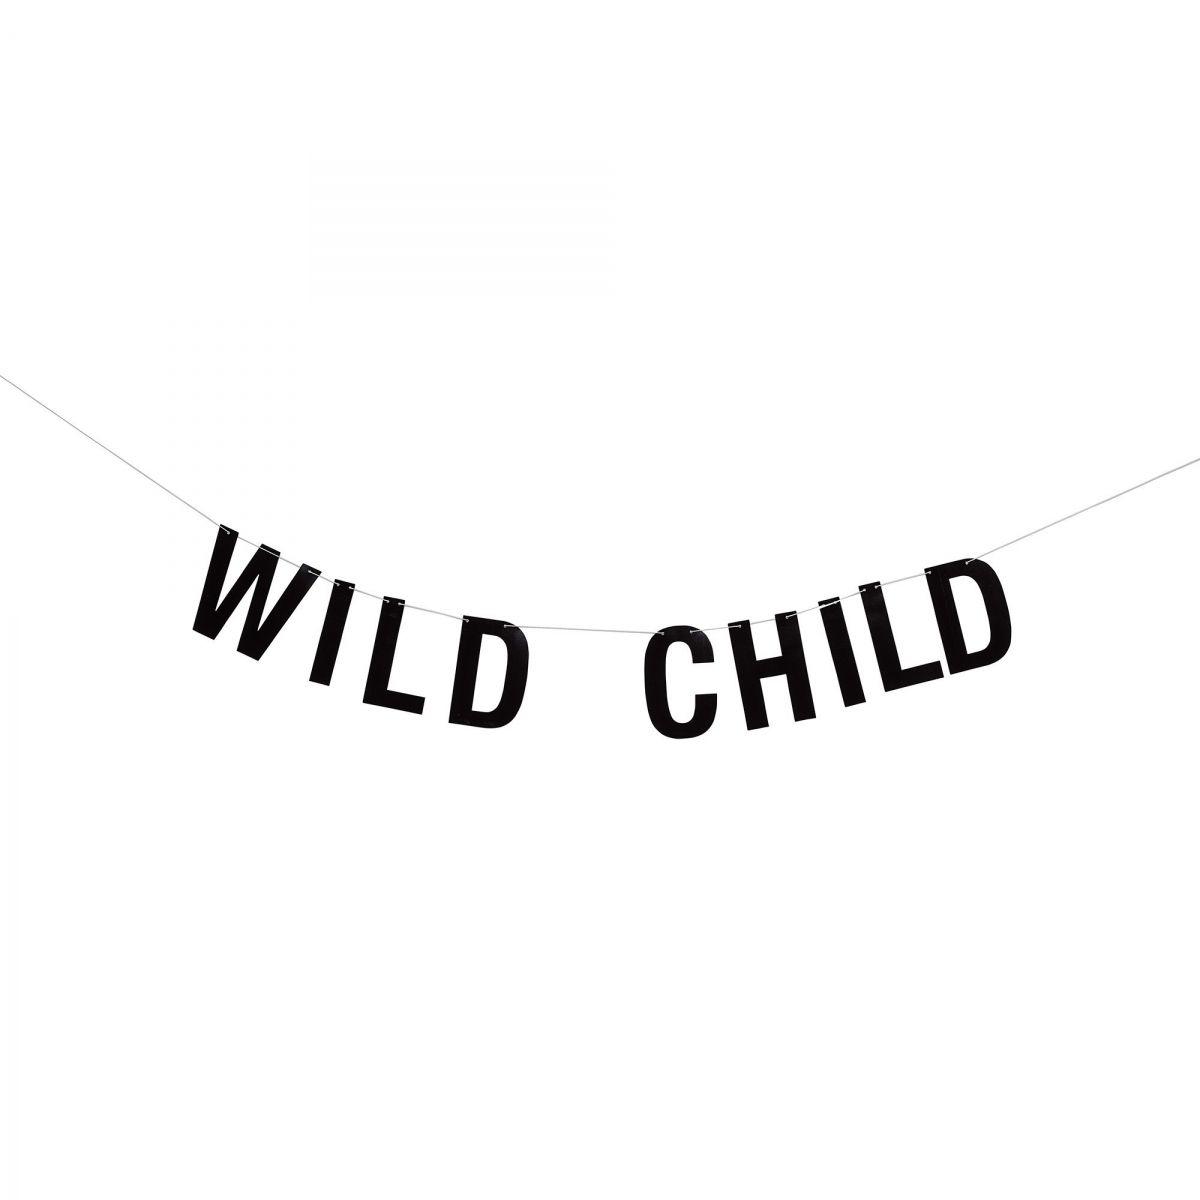 Girlanda Wild Child czarna papierowa - Bloomingville